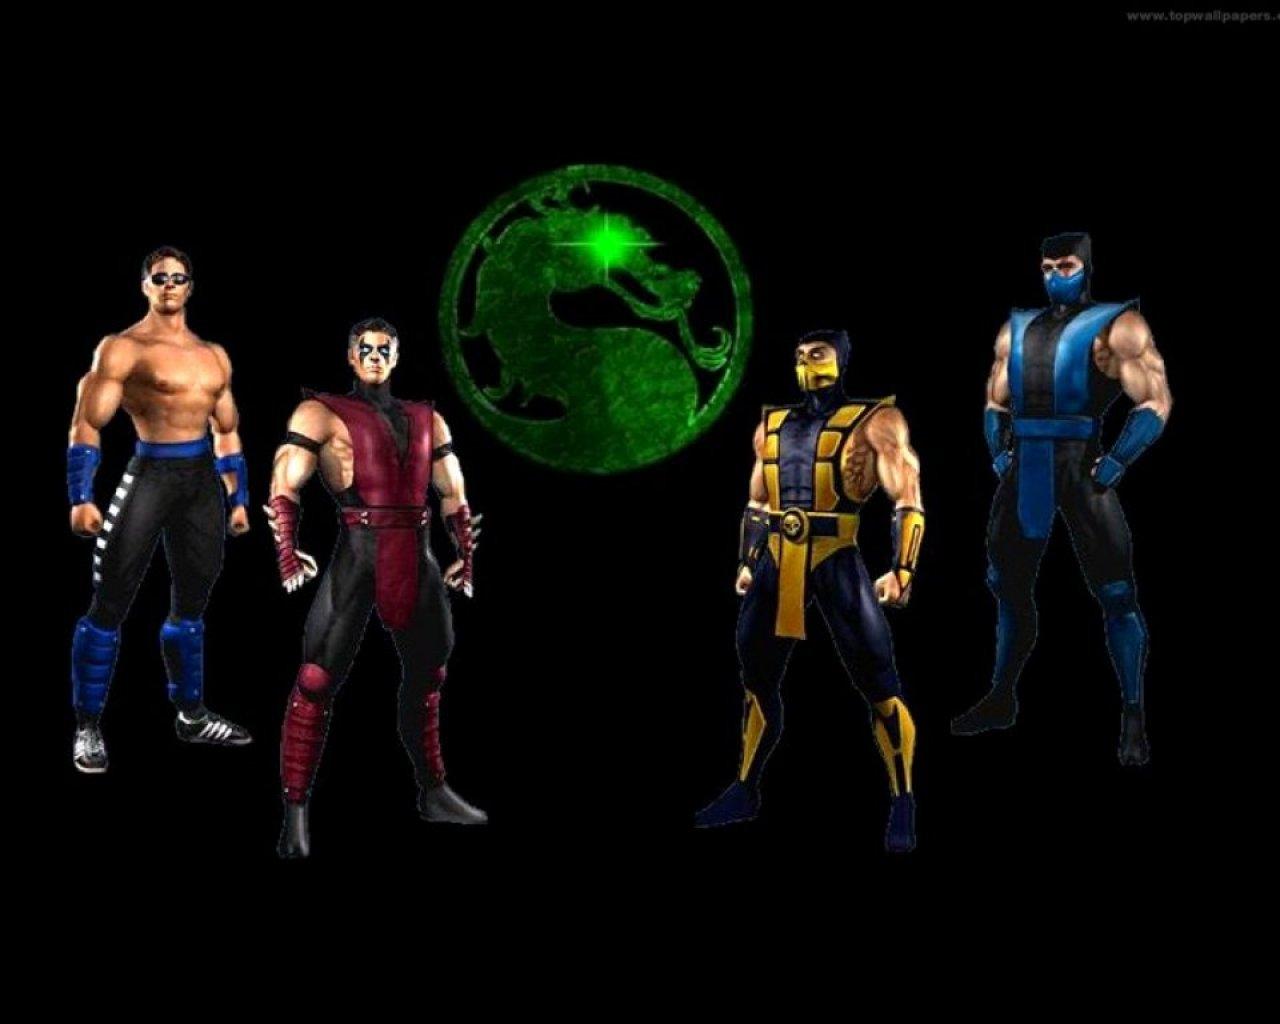 Mortal Kombat Evolution 2195-mortal-kombat-003-ioryf